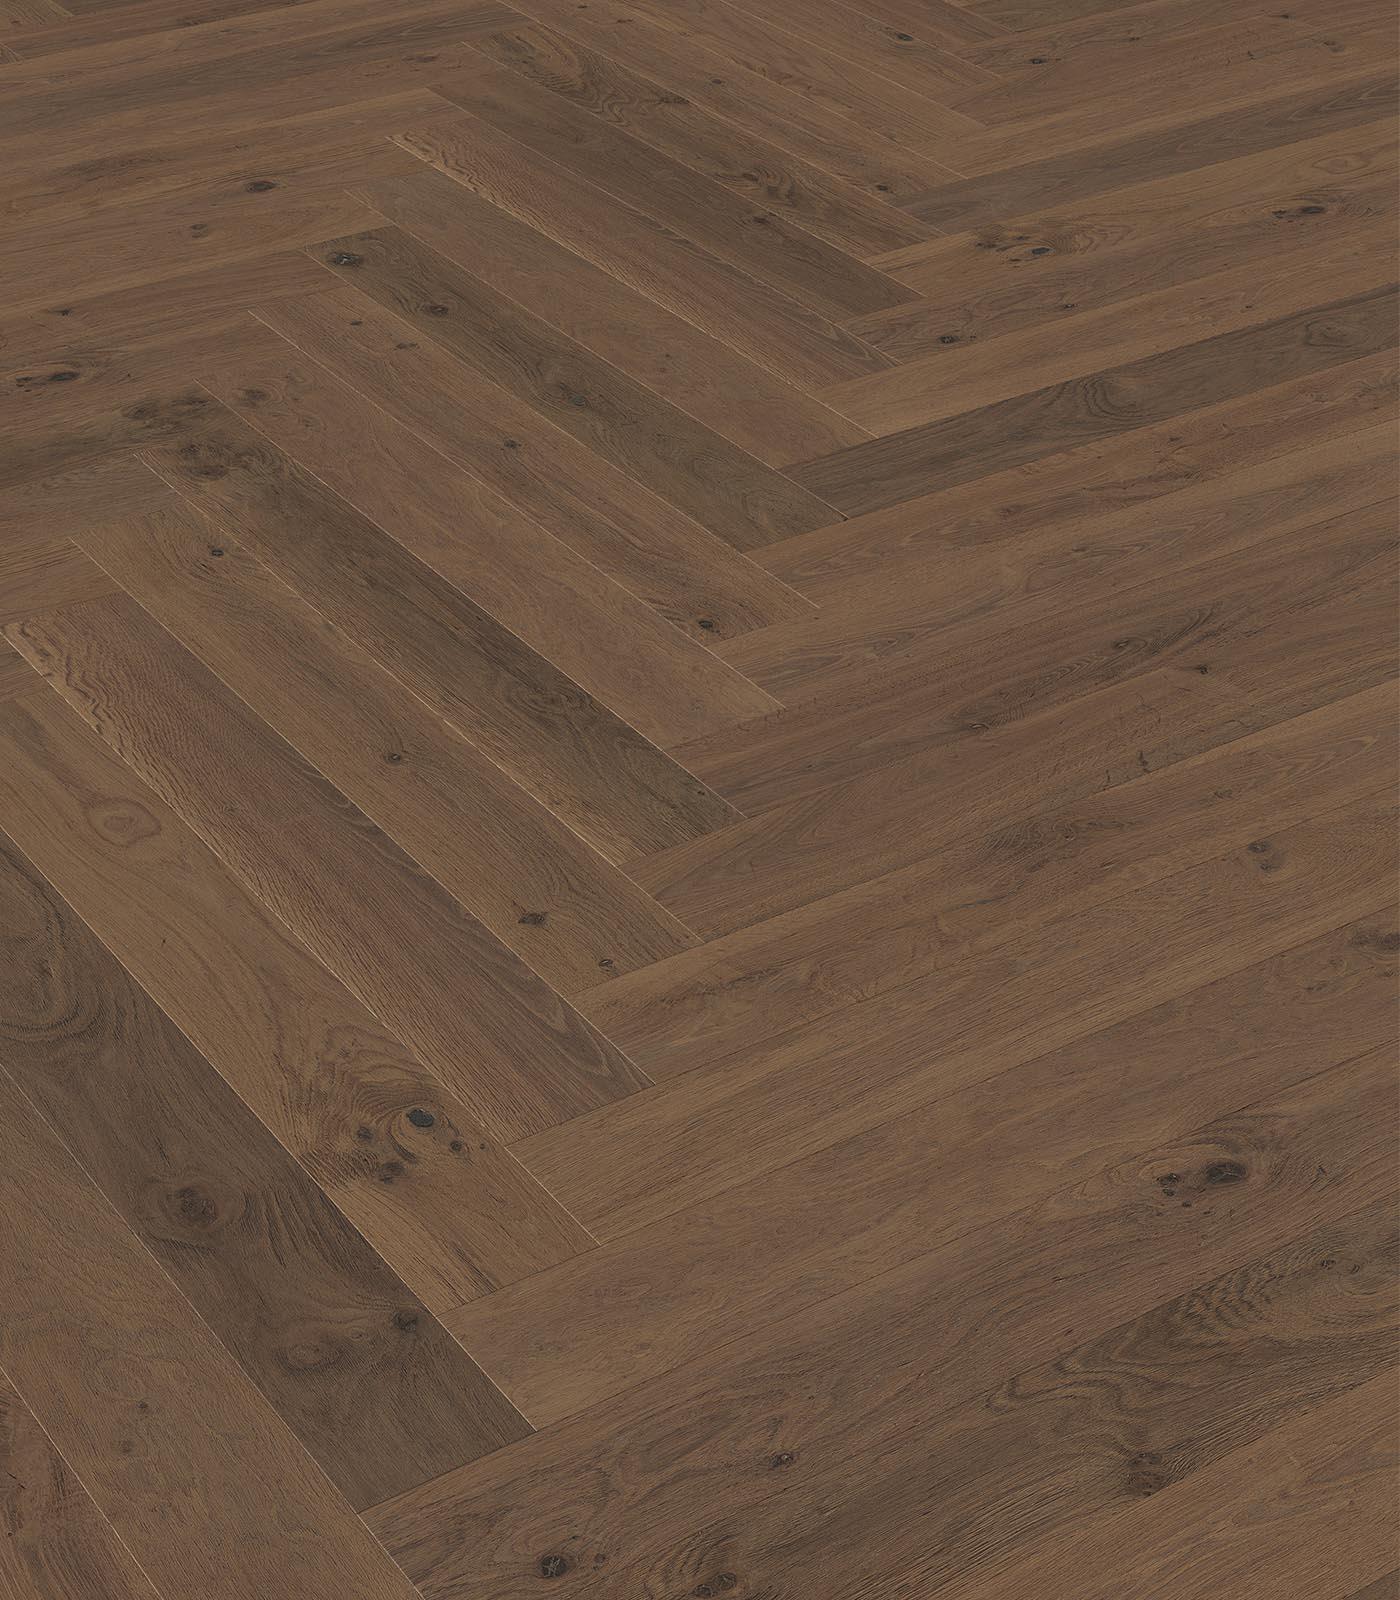 Verona-Western European oak flooring-Fashion Collection-Herringbone-angle